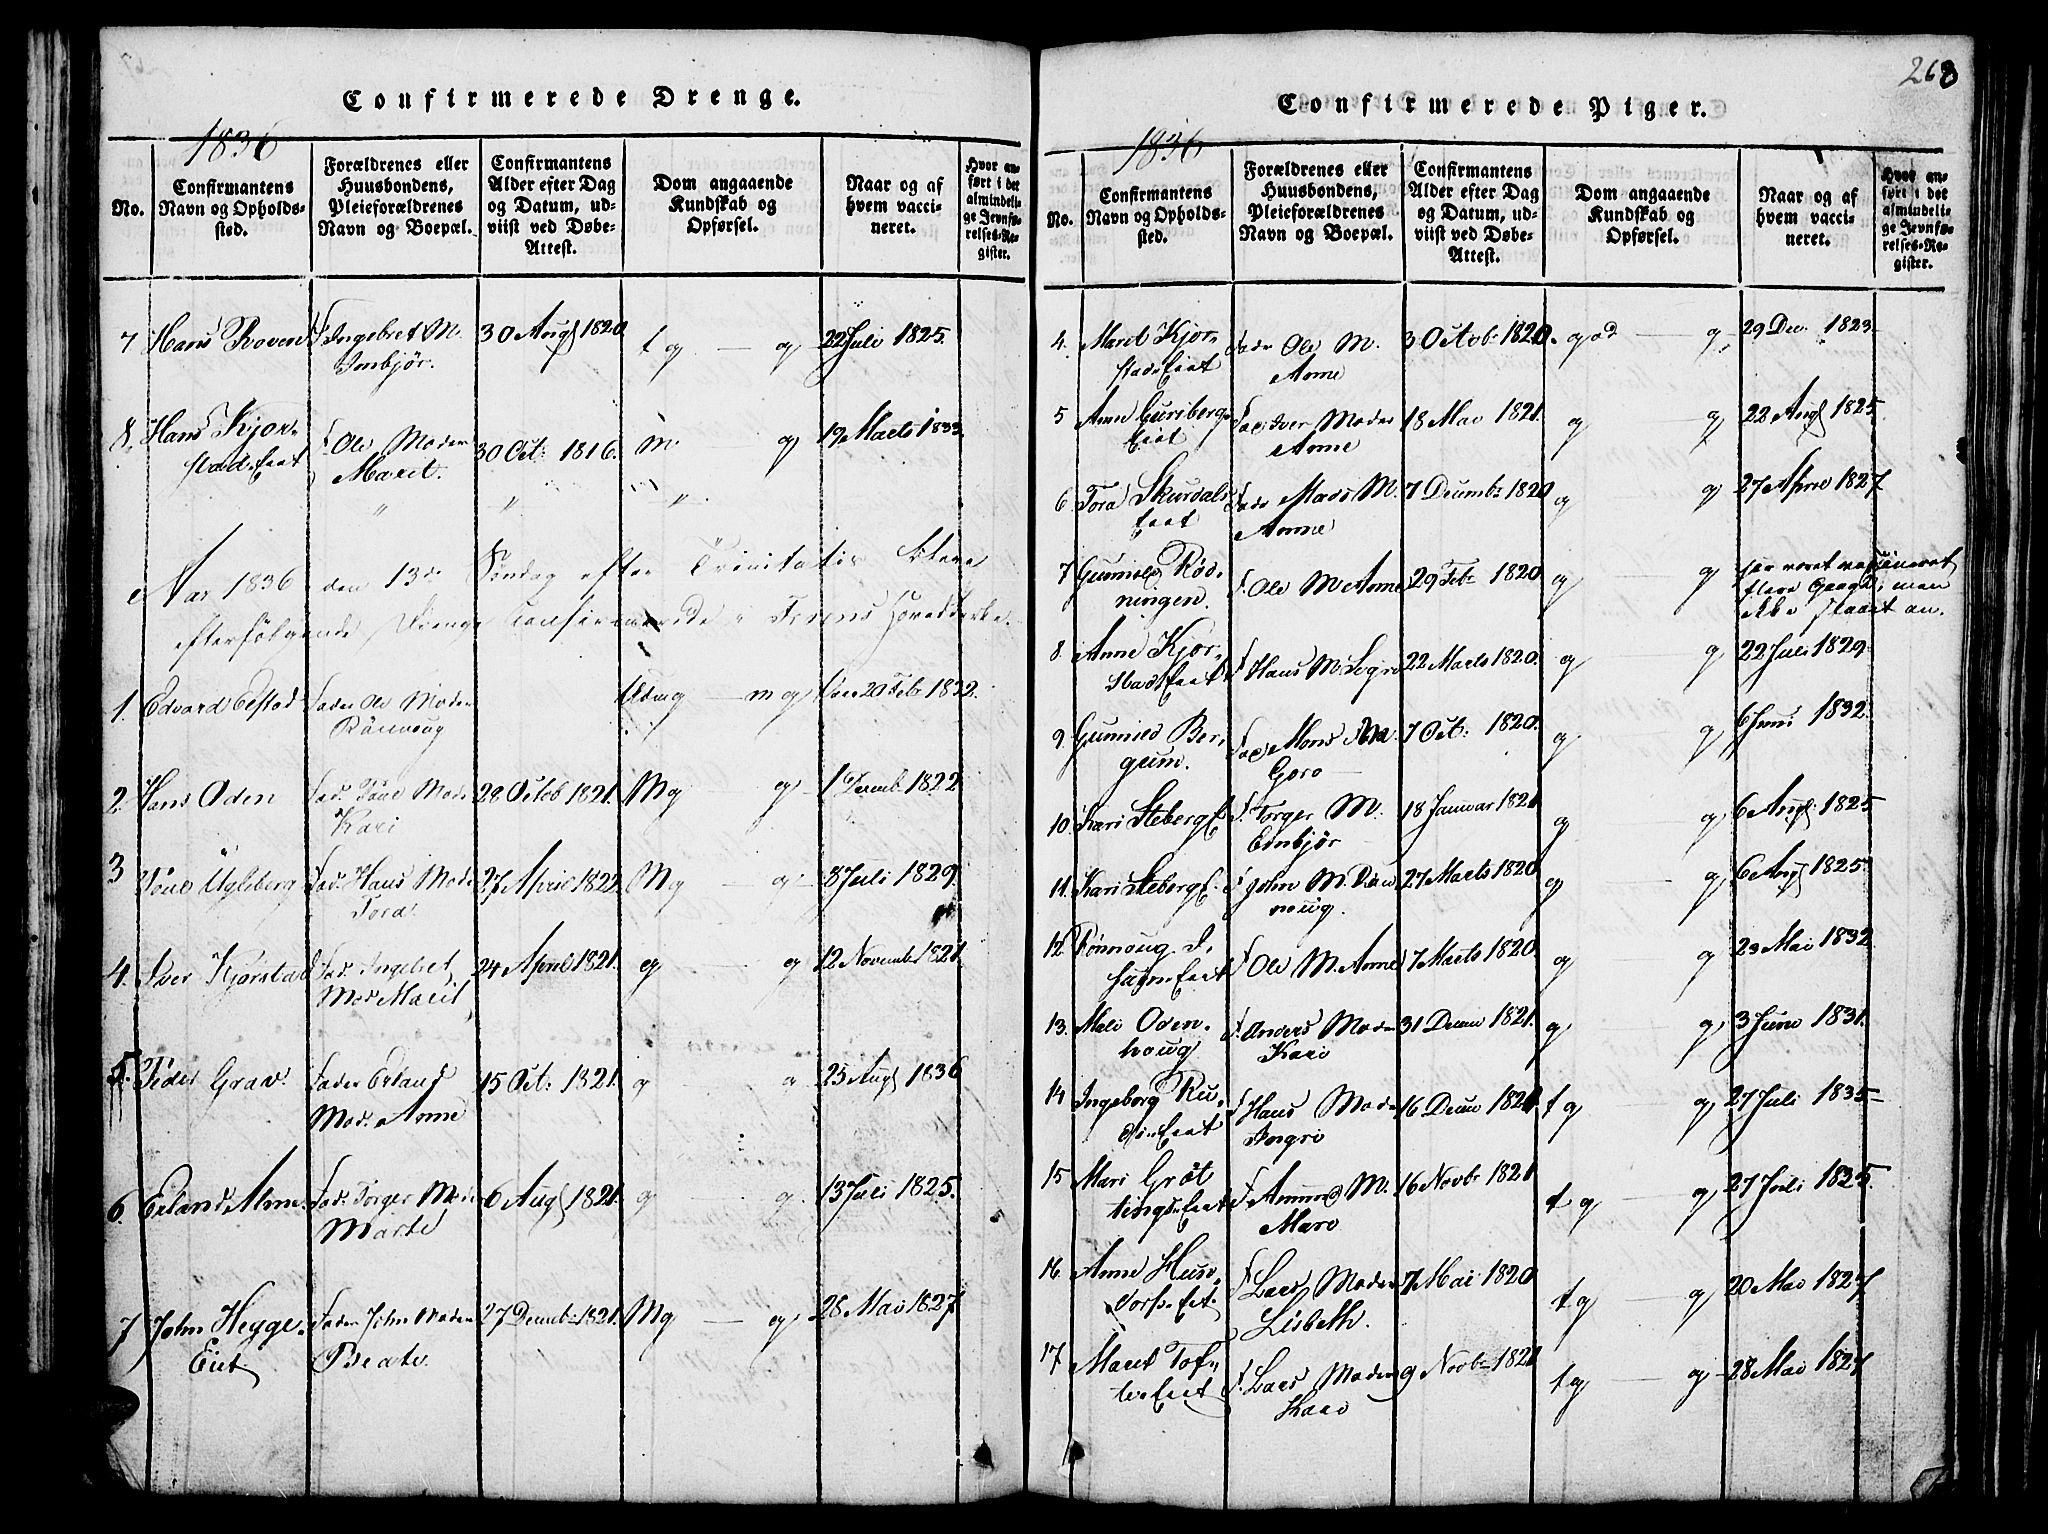 SAH, Fron prestekontor, H/Ha/Hab/L0001: Klokkerbok nr. 1, 1816-1843, s. 268